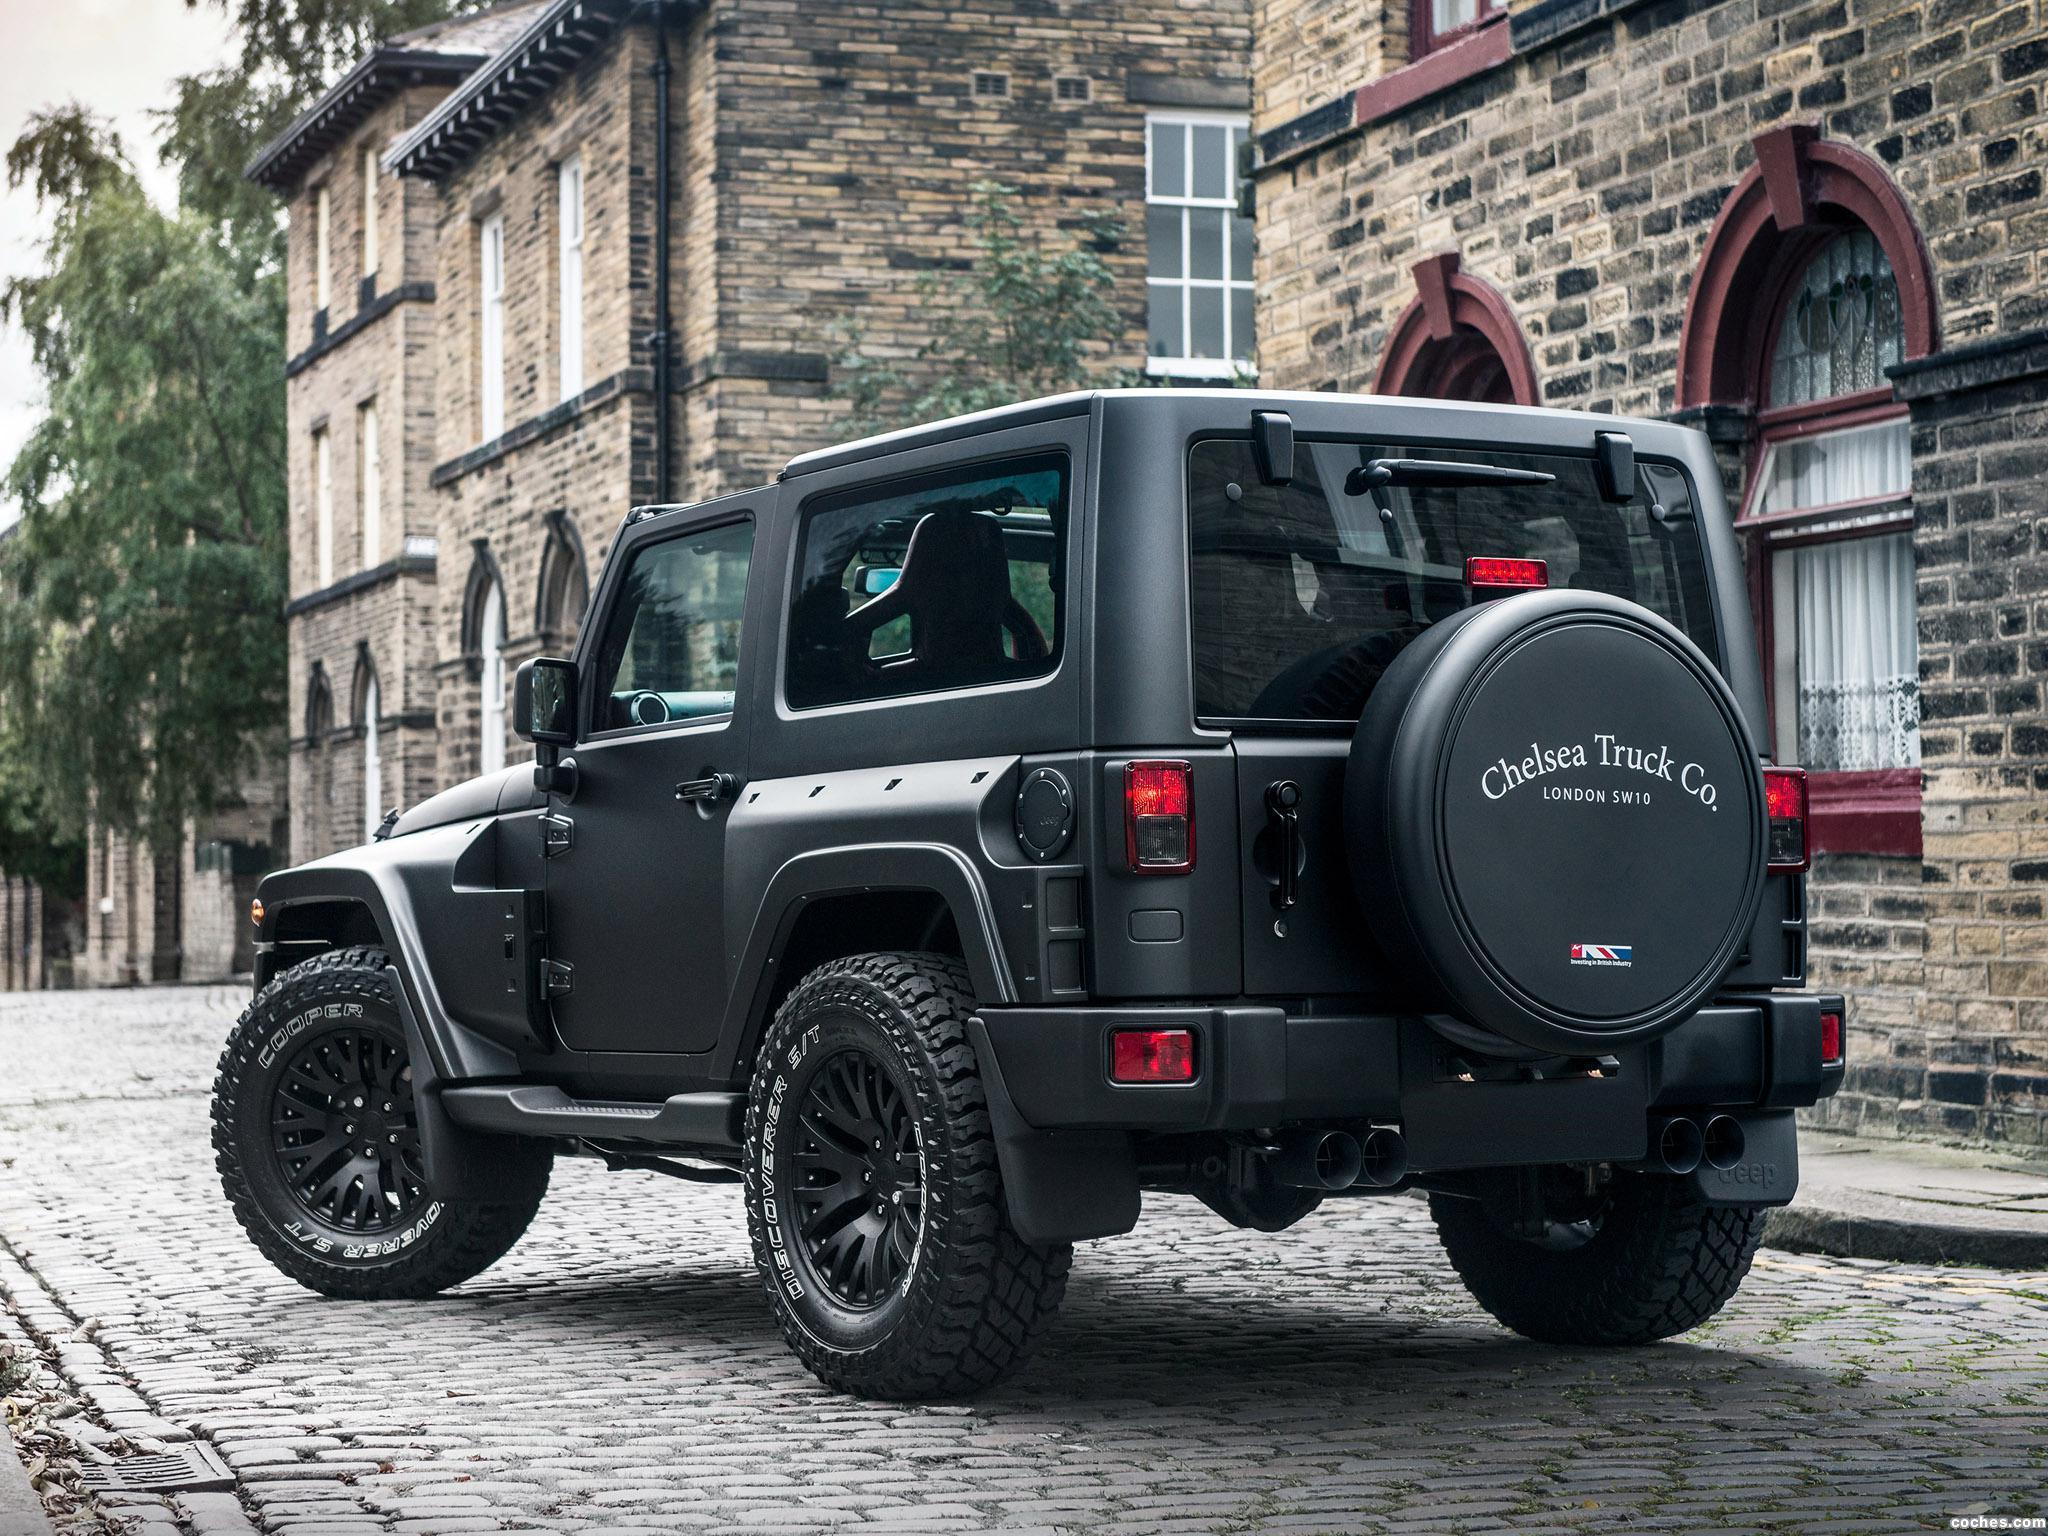 Foto 1 de Project Kahn Jeep Wrangler Black Hawk Edition 2016